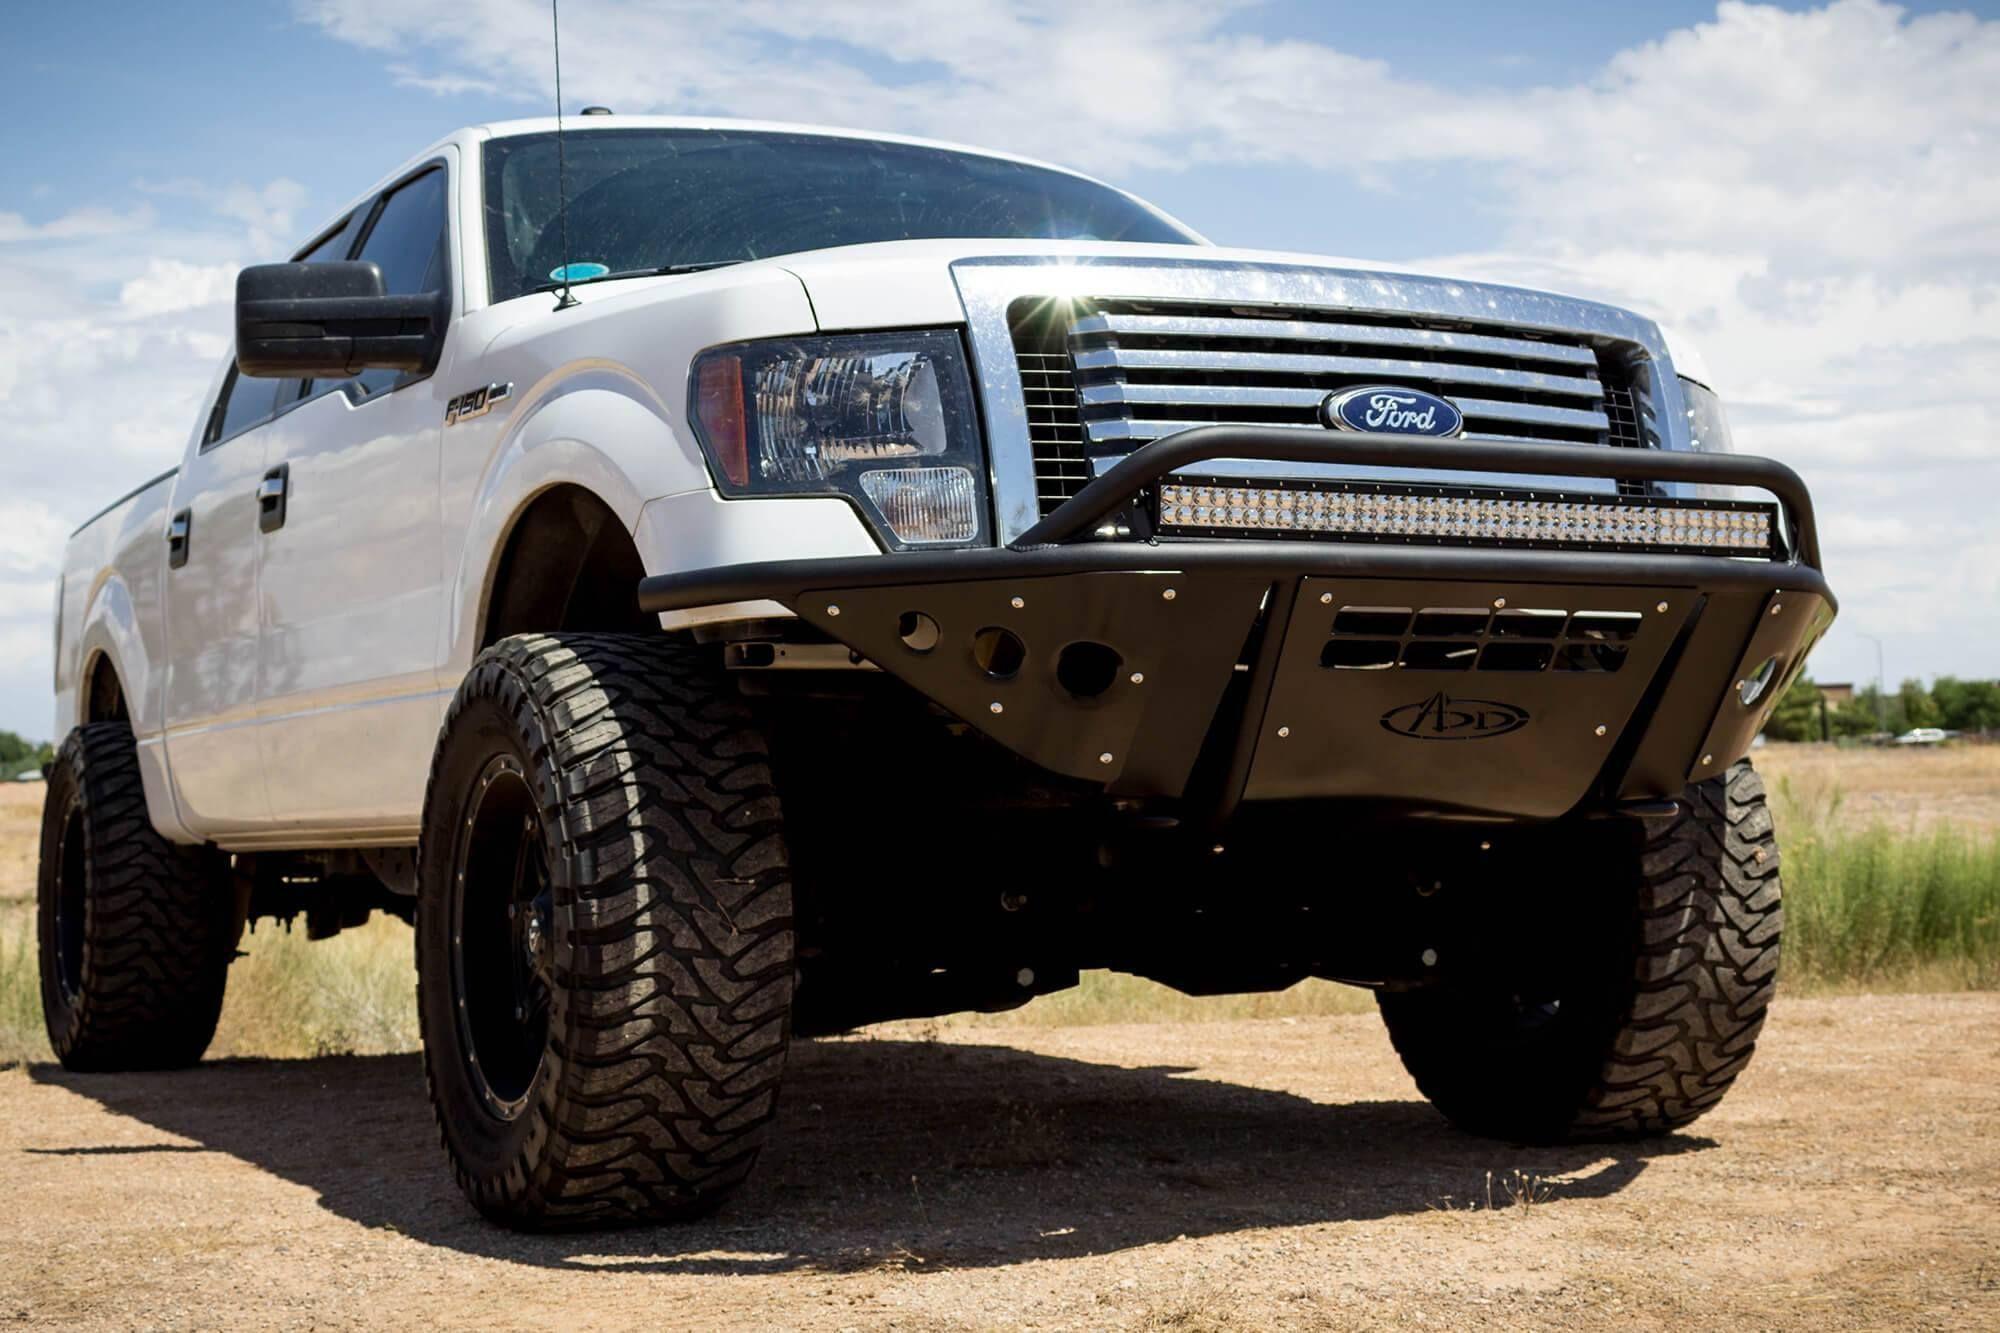 2009 2014 F 150 Stealth Front Bumper Non Winch Version Custom Trucks Ford Trucks Trucks